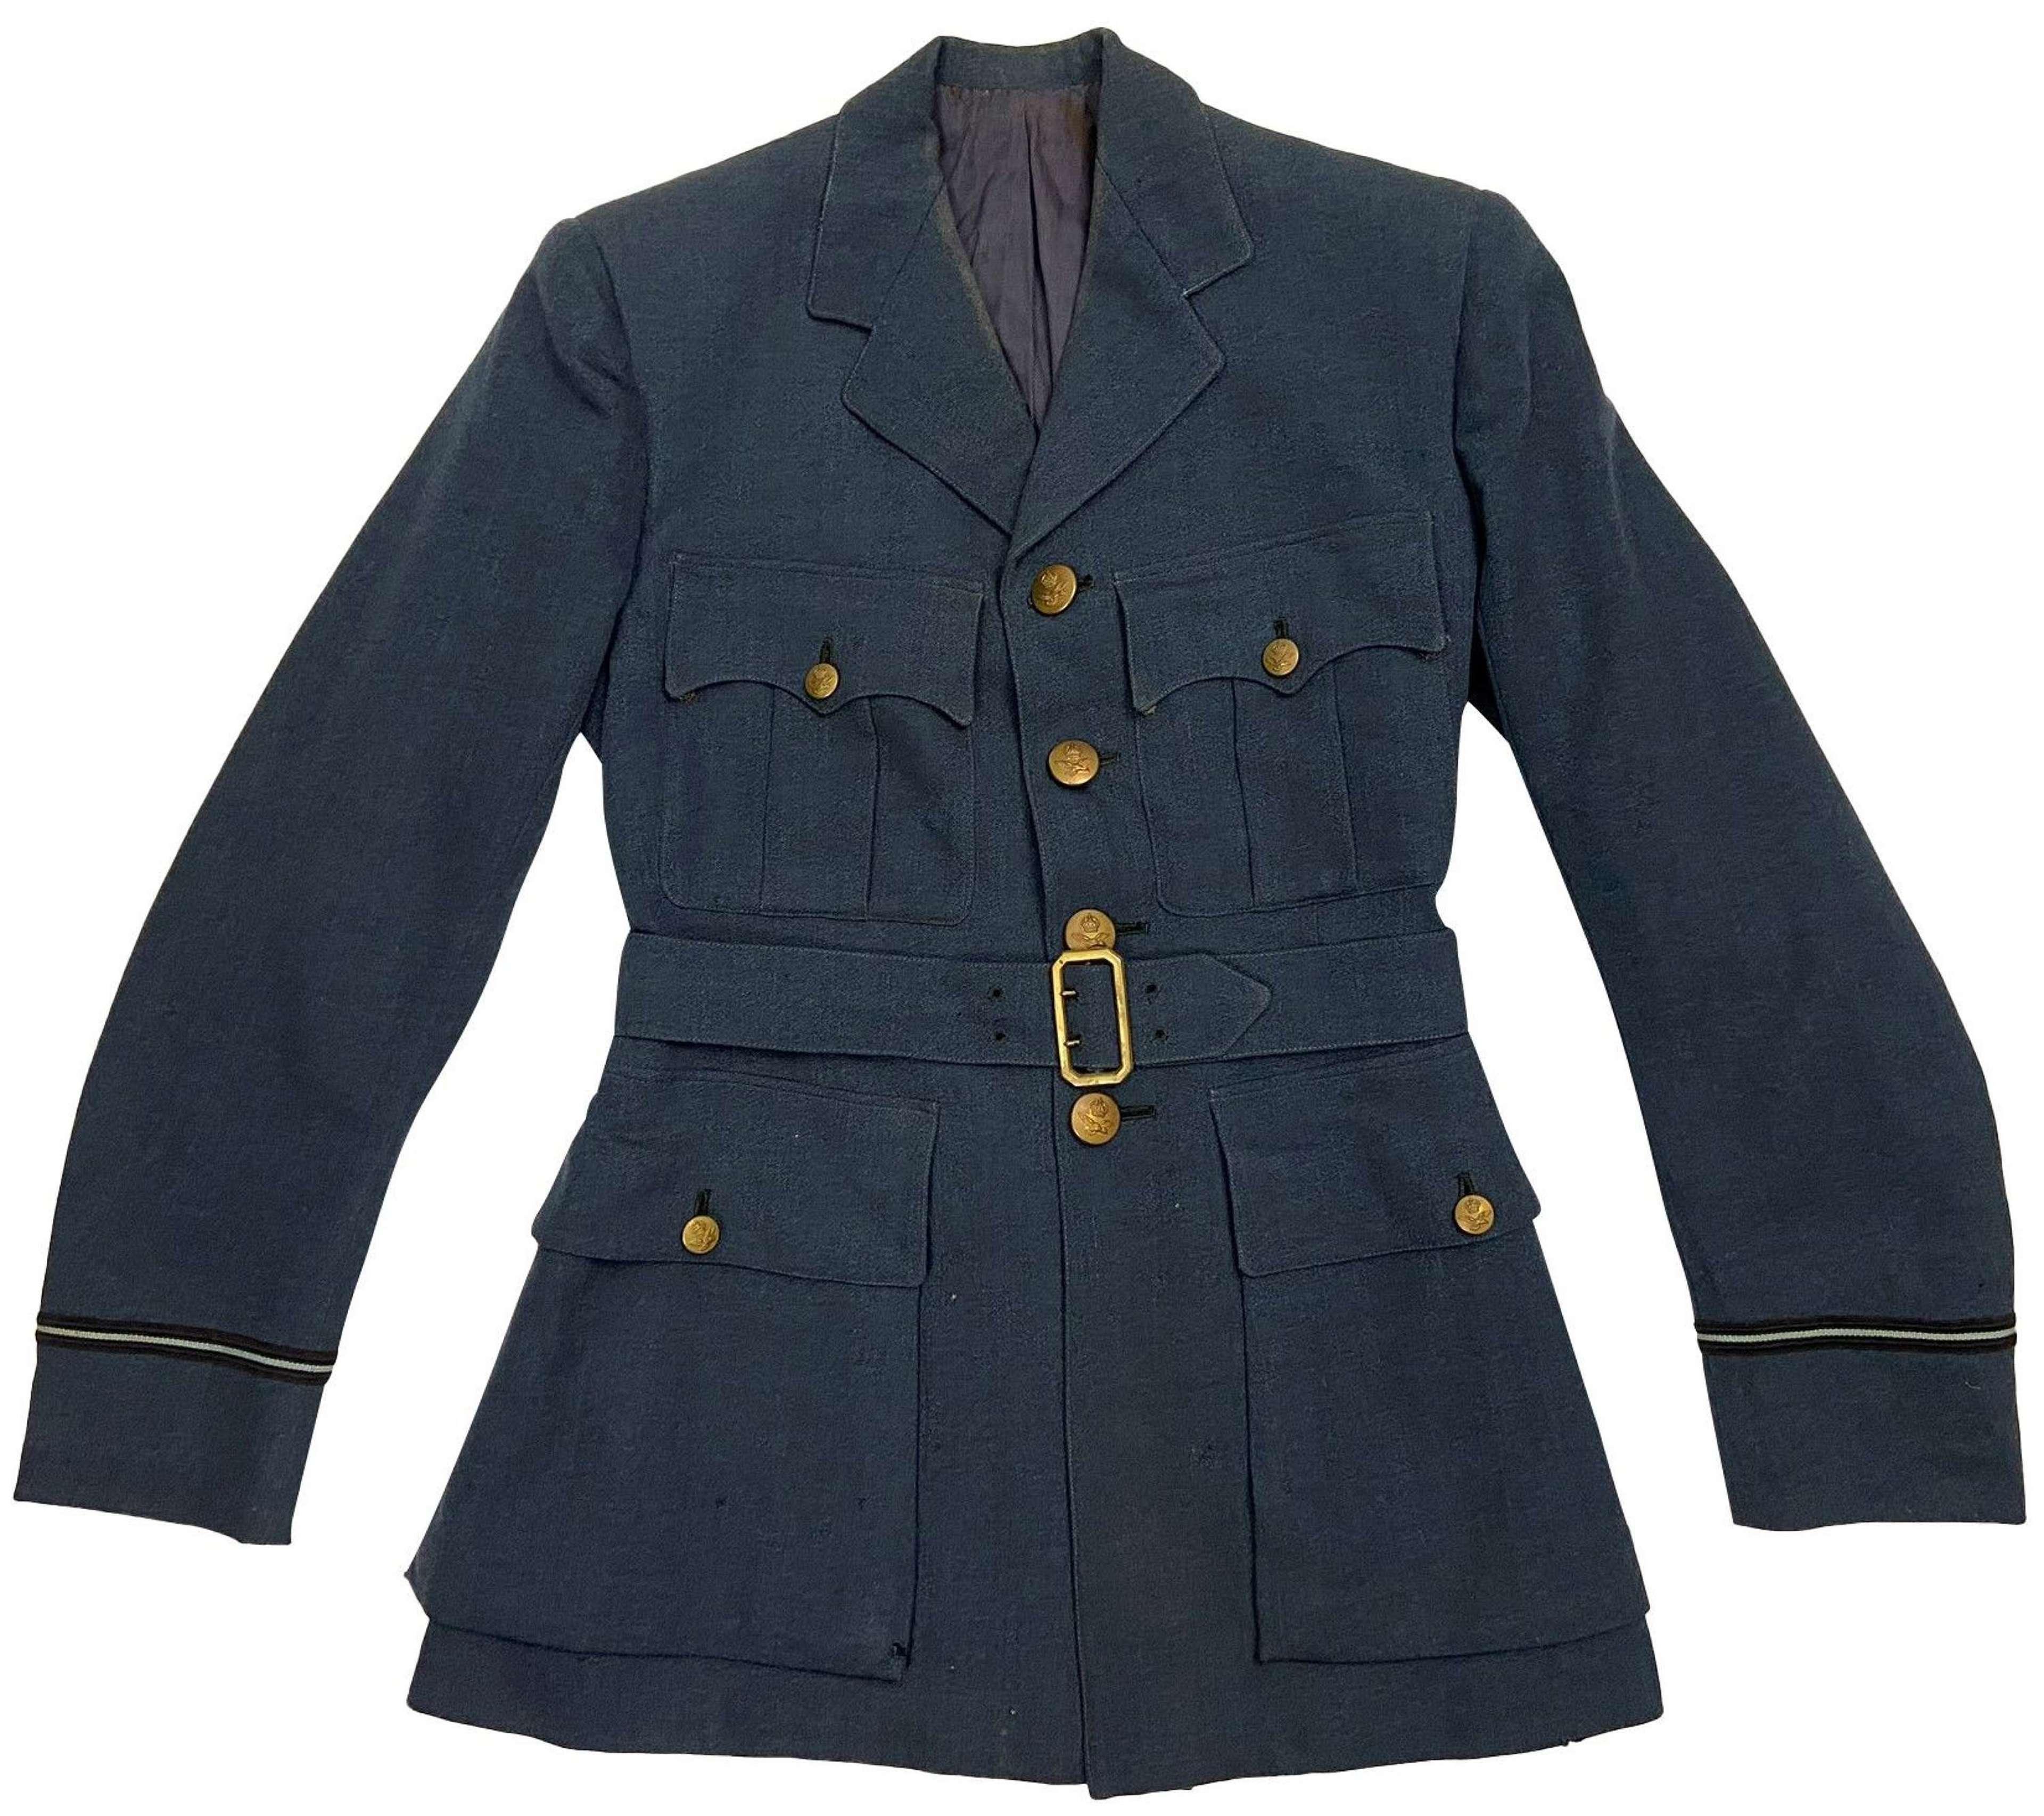 Original 1944 Dated RAF Officers Service Dress Jacket - G. Newton